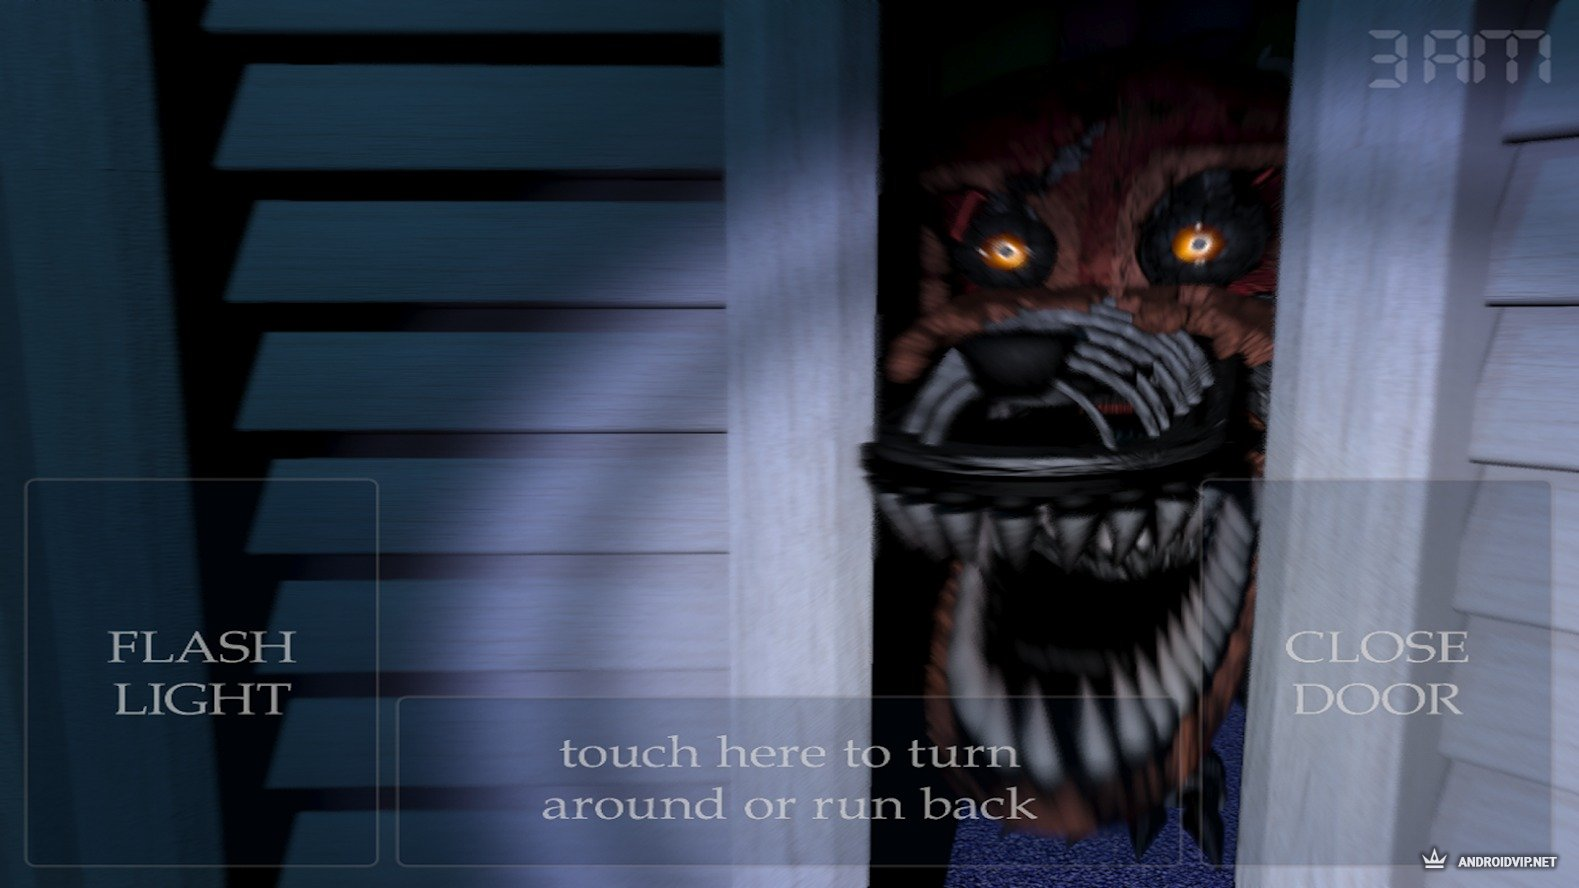 ФНАФ 4 - скриншот